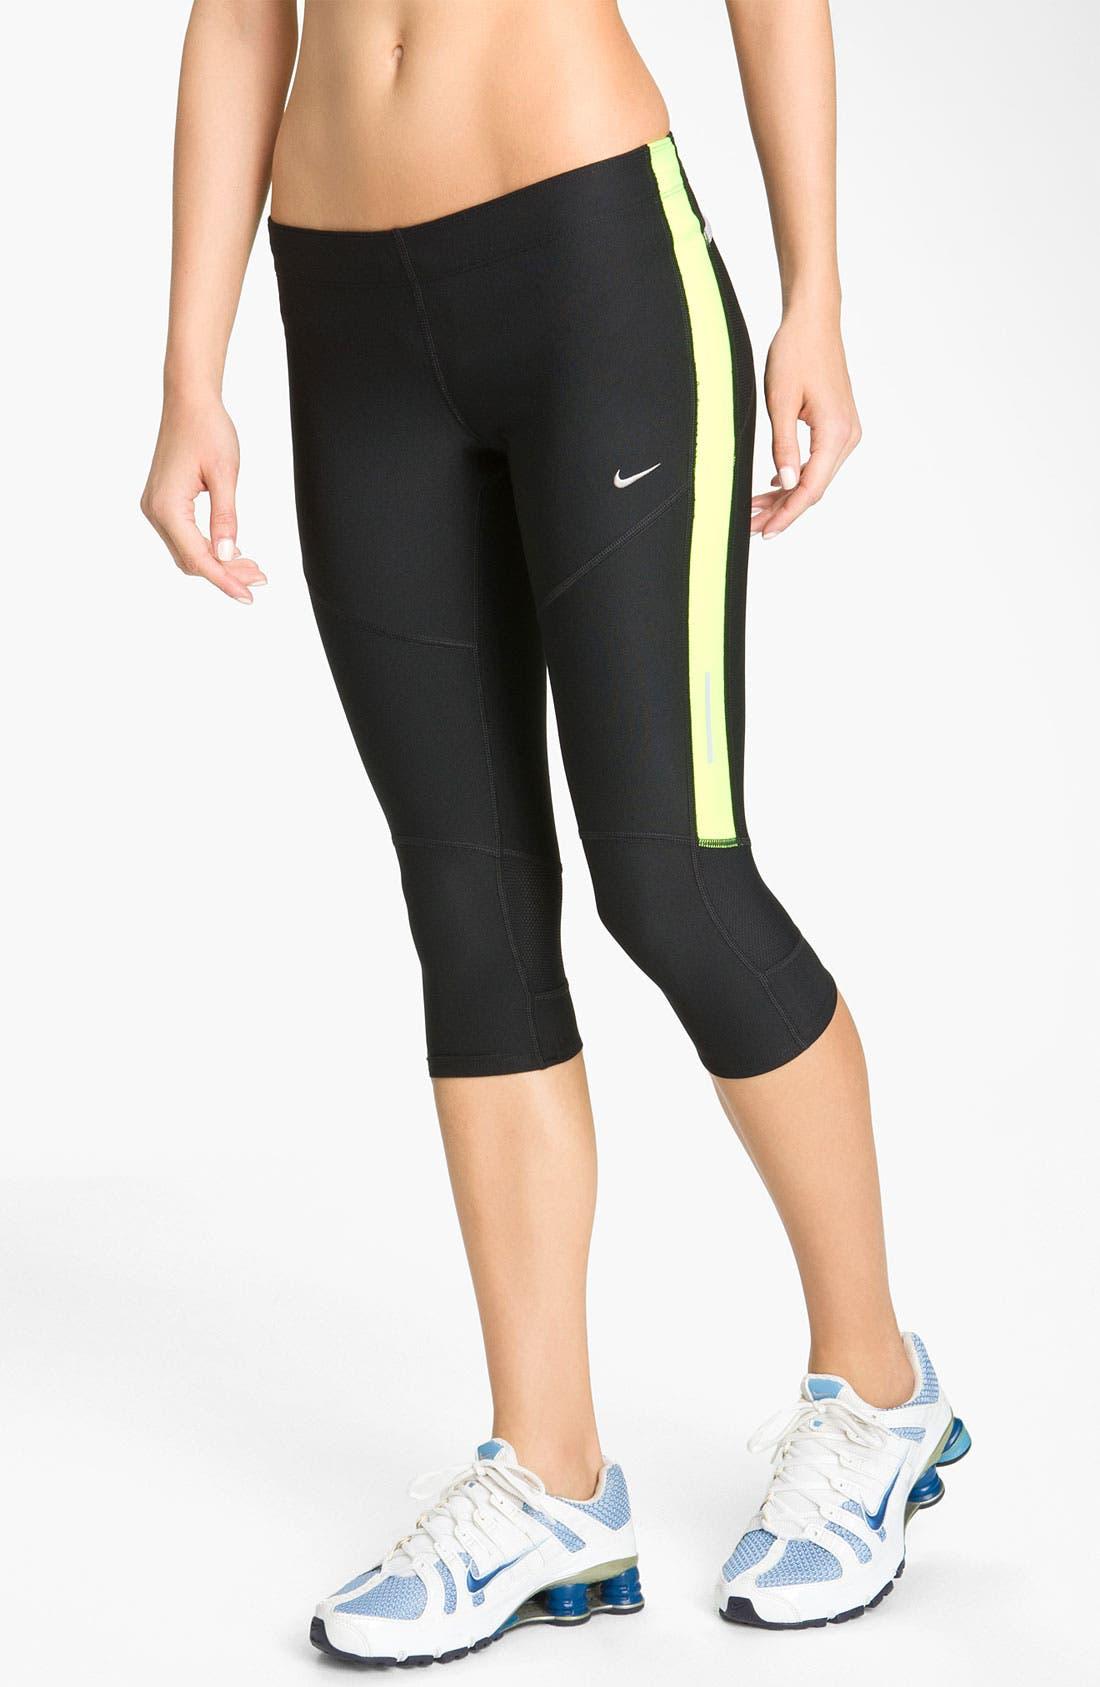 Main Image - Nike 'Tech' Running Capris